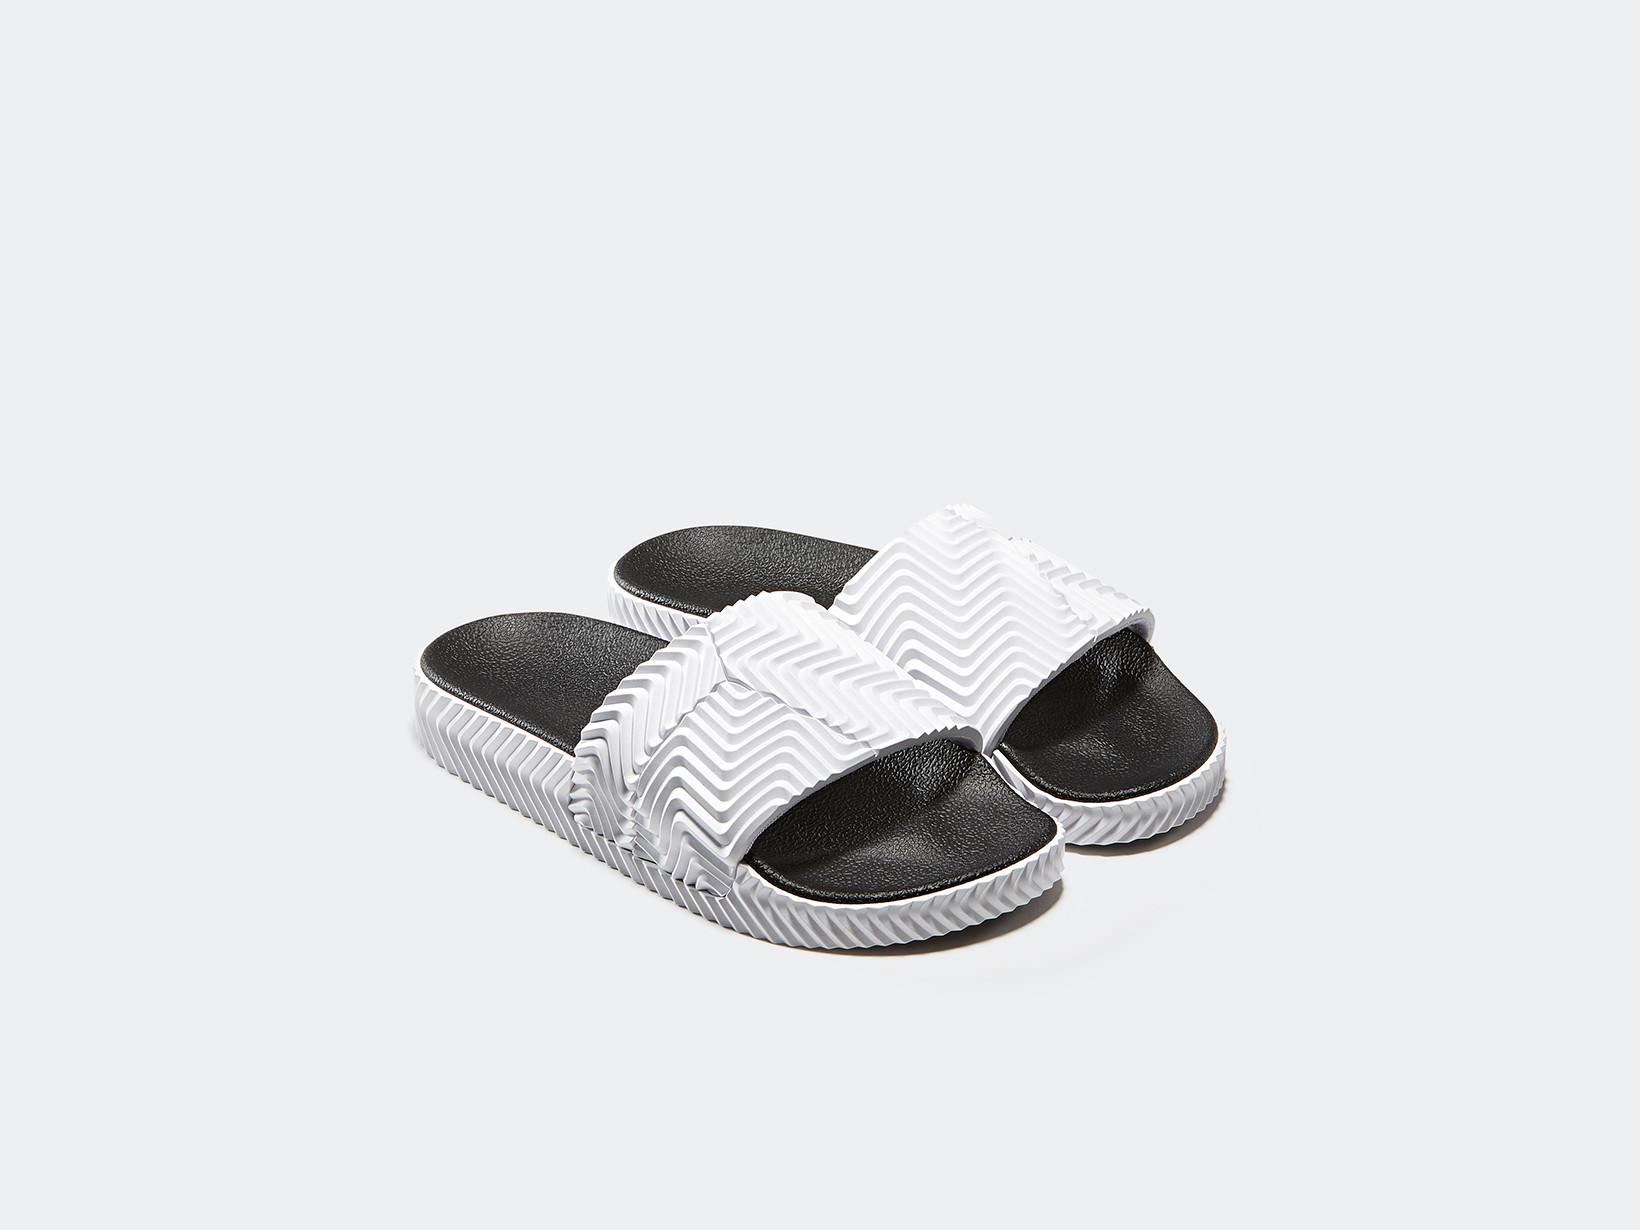 https---hypebeast.com-image-2018-06-adidas-originals-alexander-wang-season-3-drop-3-31